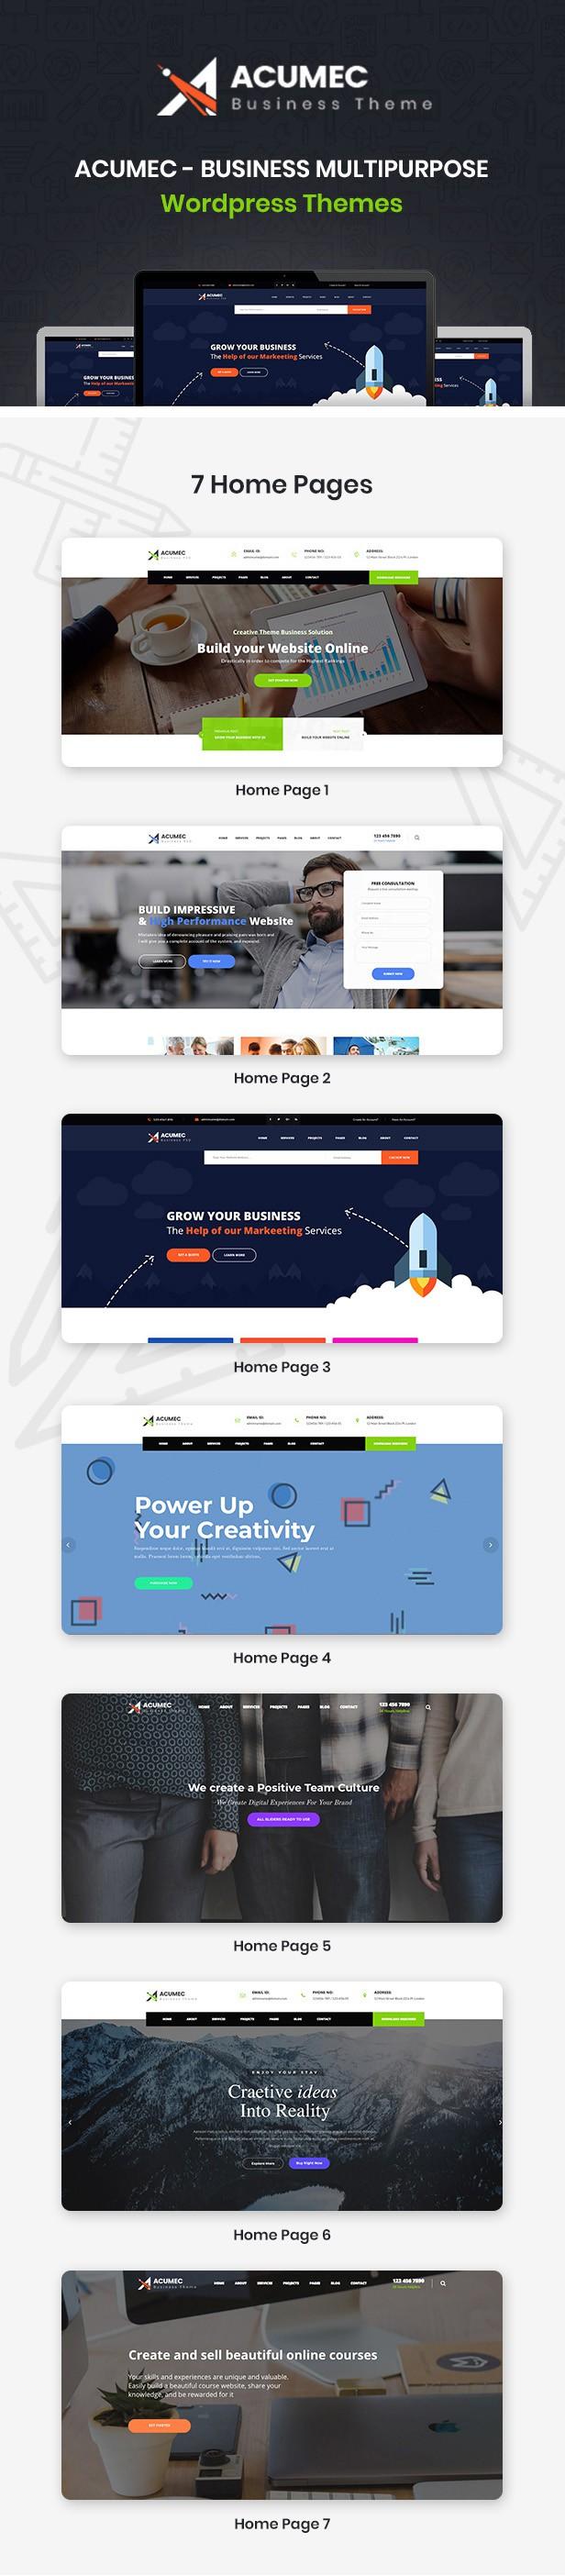 Acumec - Business Multipurpose WordPress Theme - 10